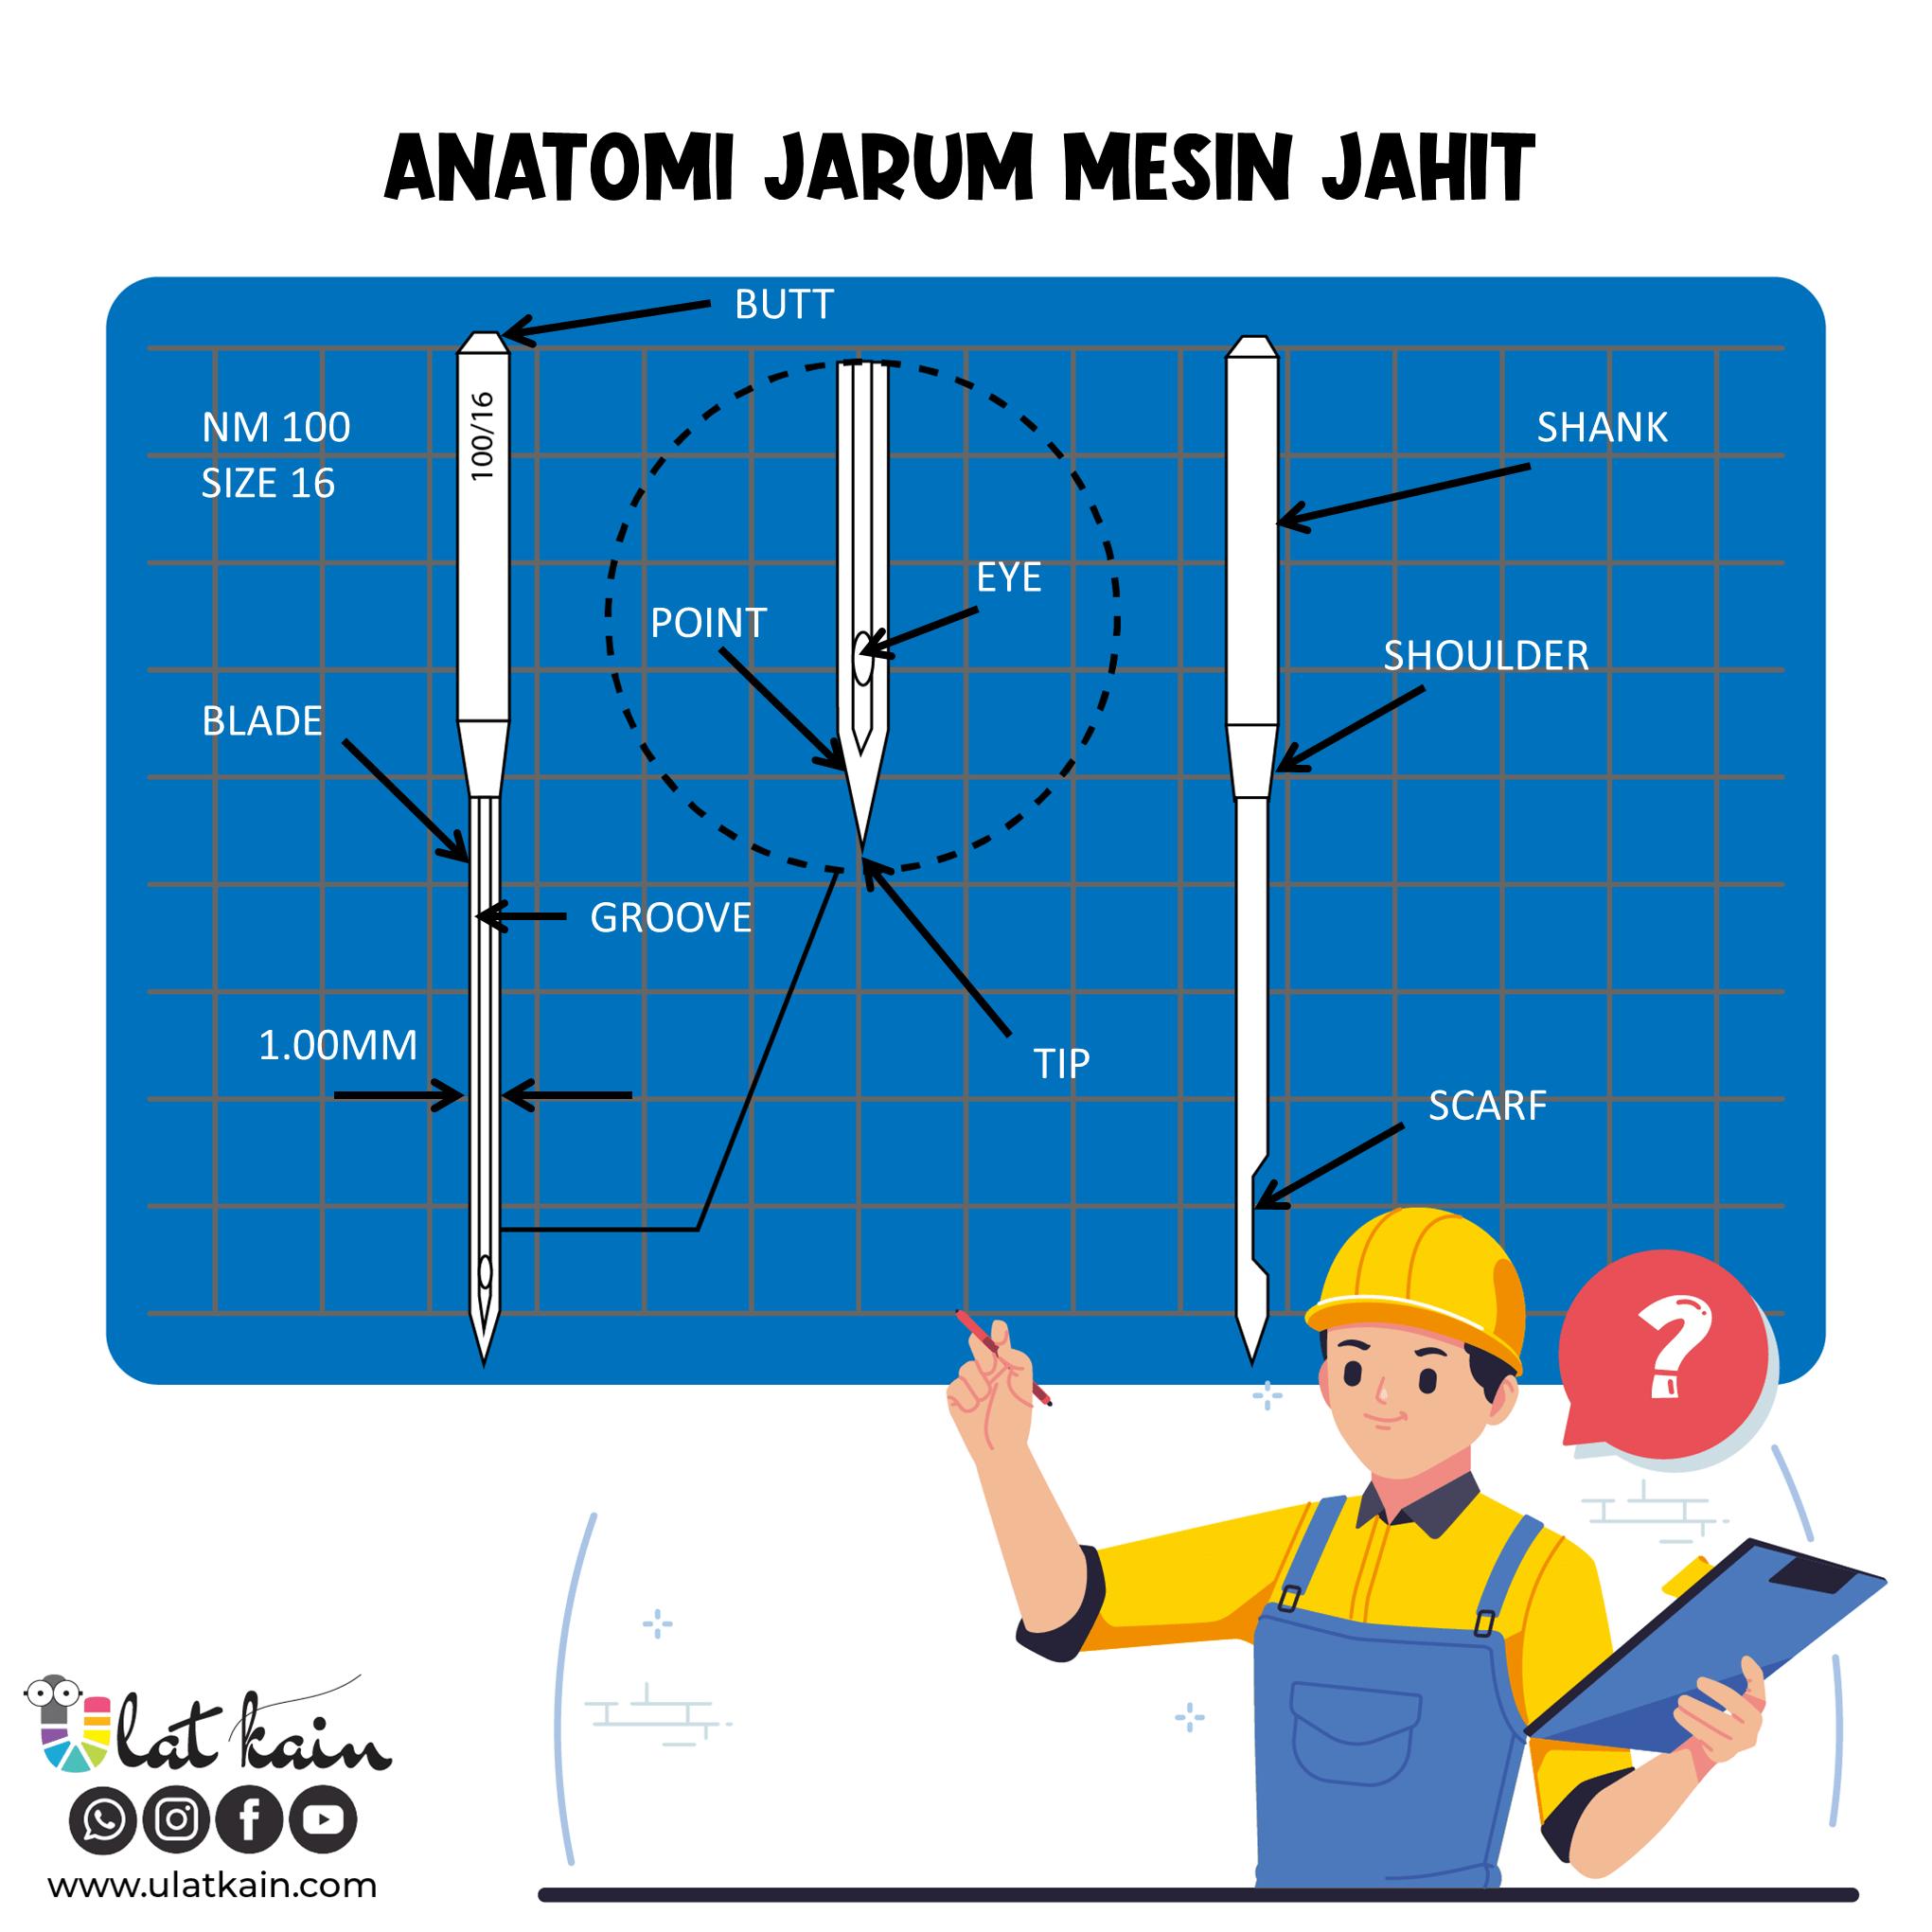 Anatomi Jarum Mesin Jahit